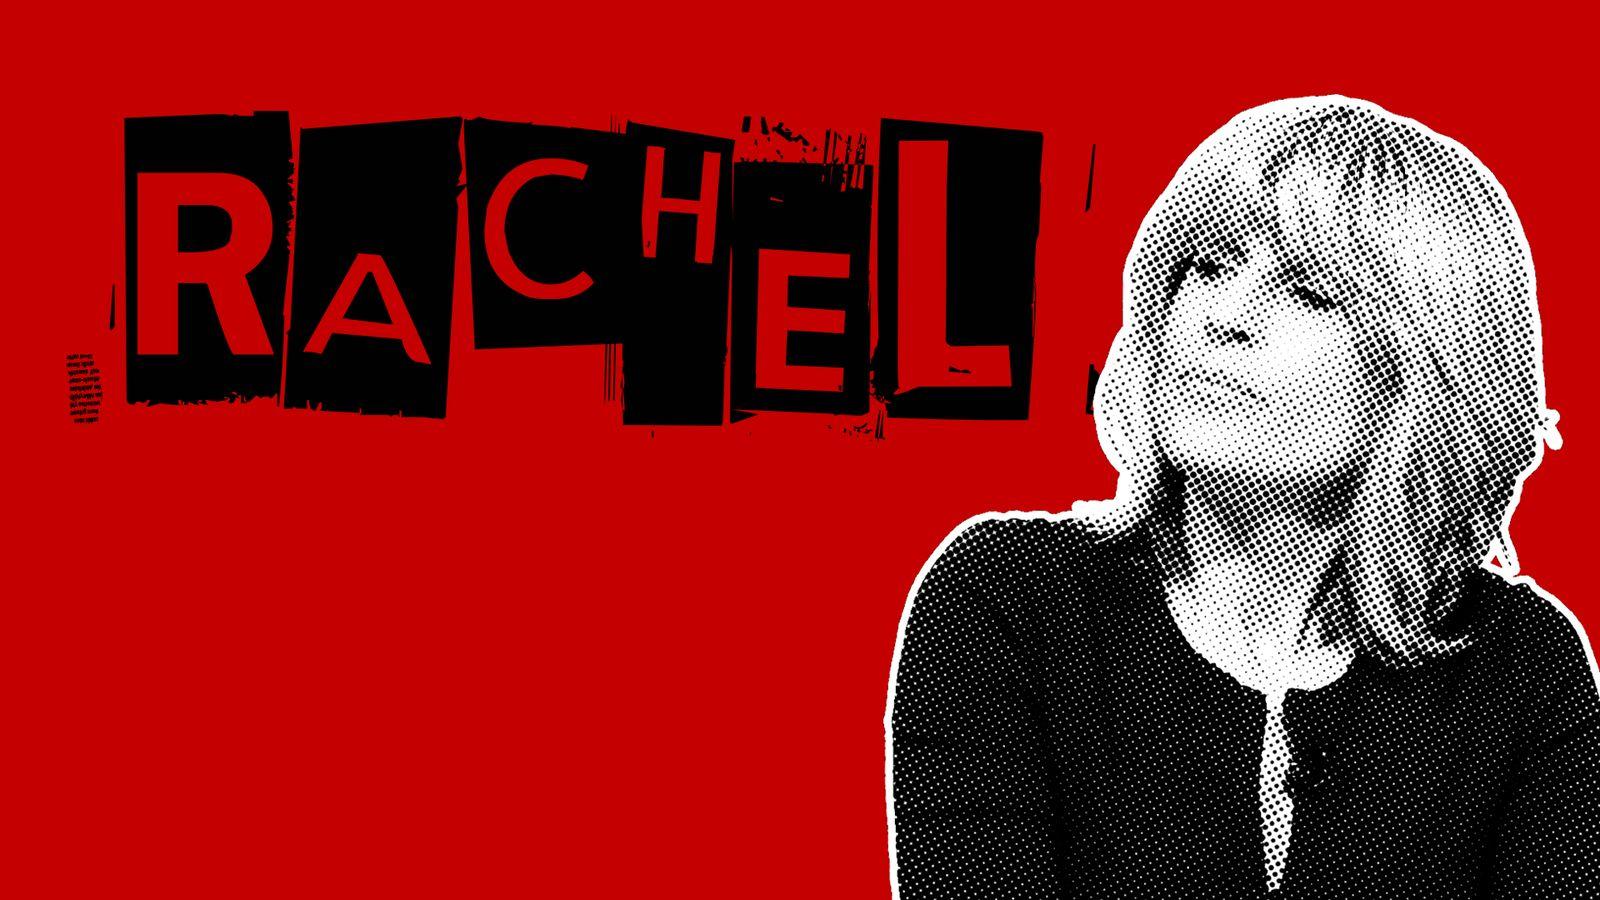 Boris Johnson shows remorse after sister Rachel says